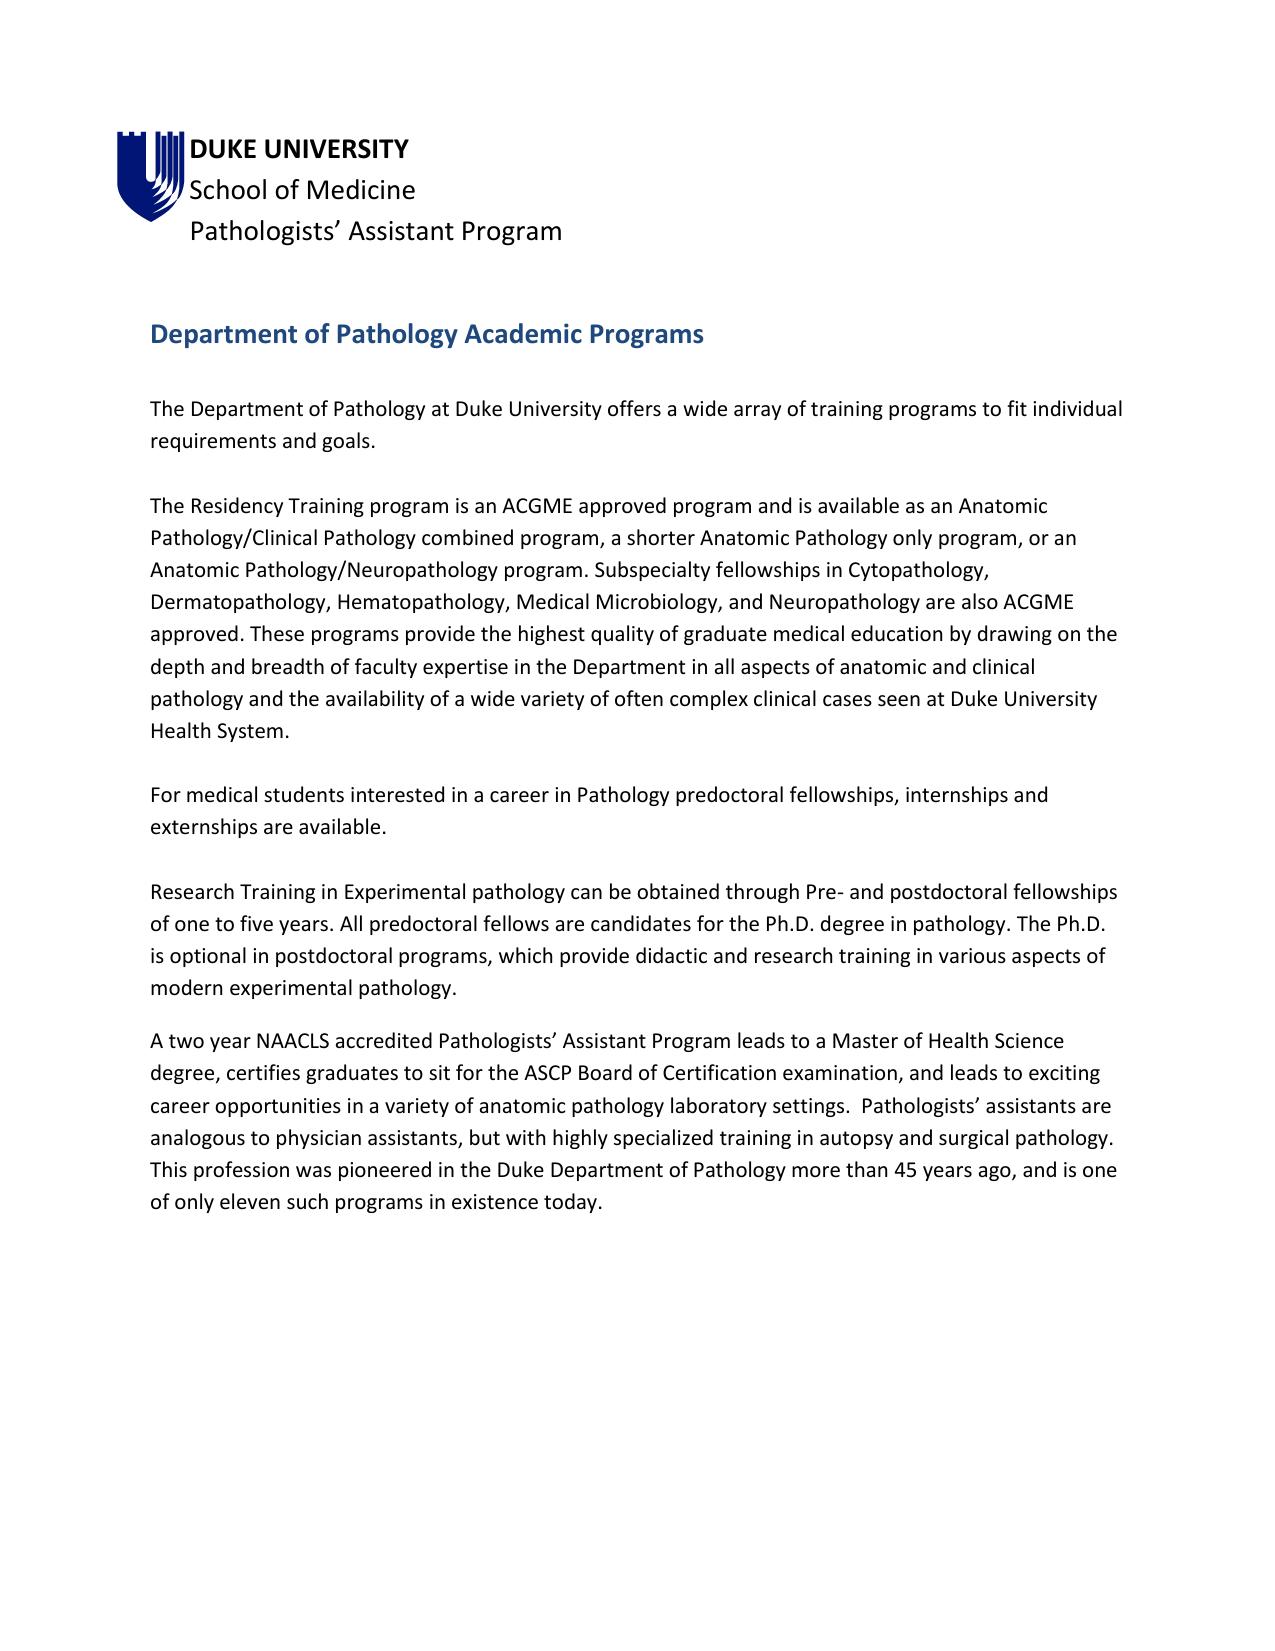 Printable Brochure PDF - Duke Department of Pathology